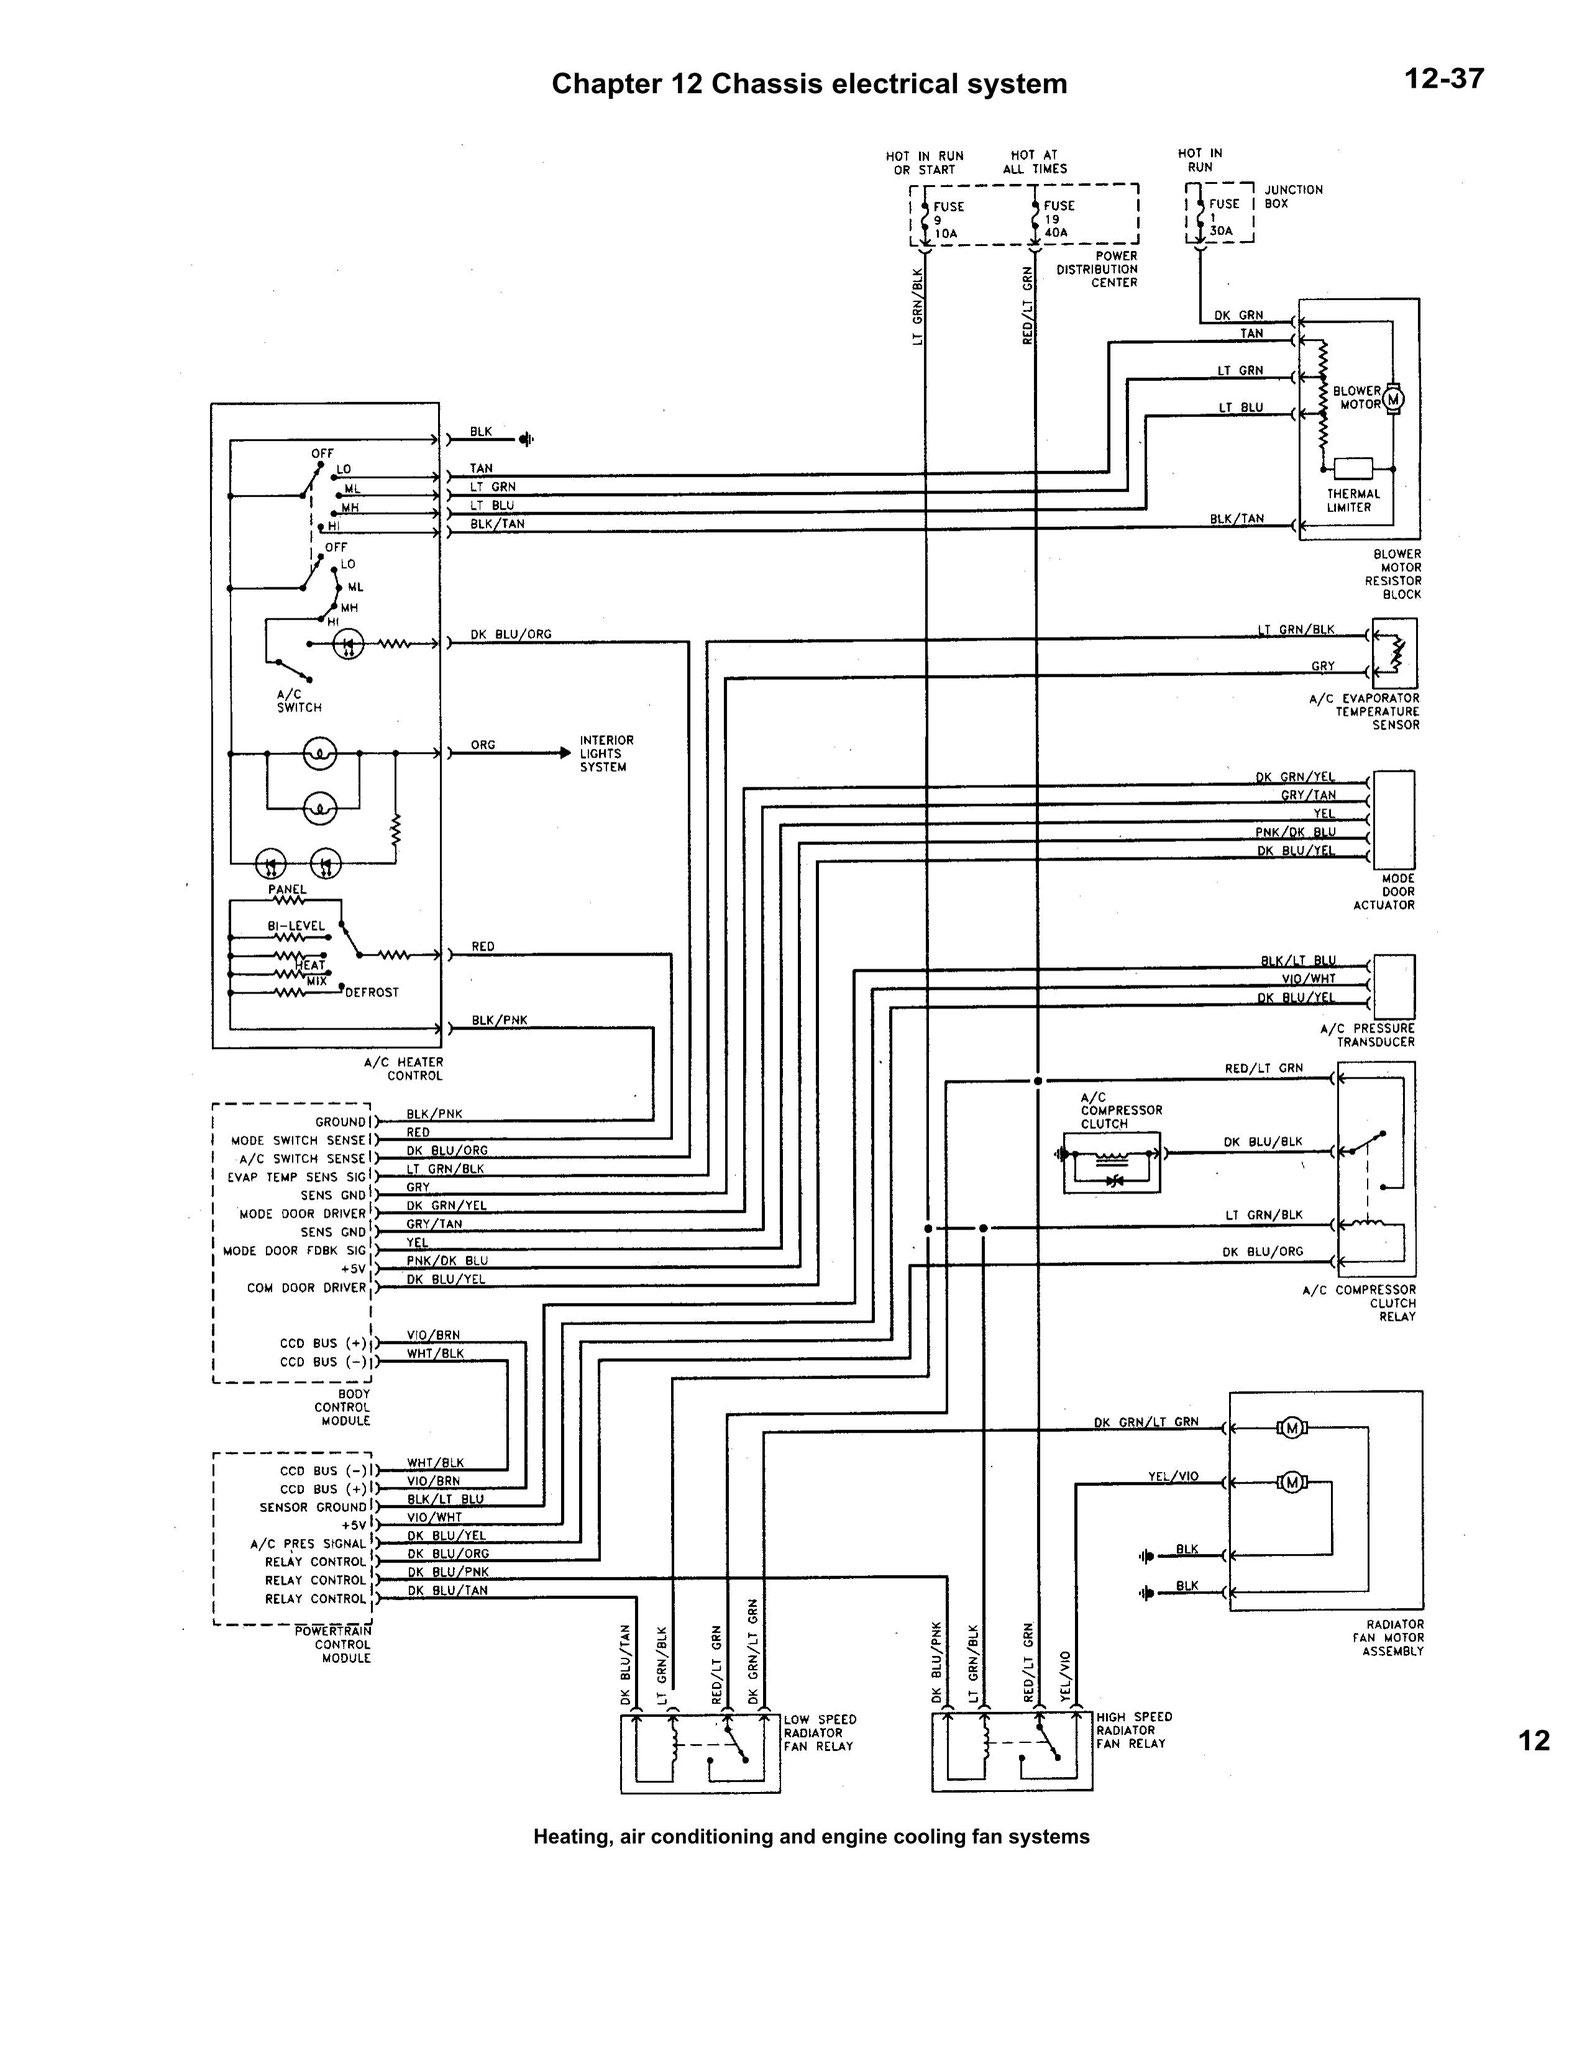 [DIAGRAM] 1999 Plymouth Van Radio Wiring Diagram FULL